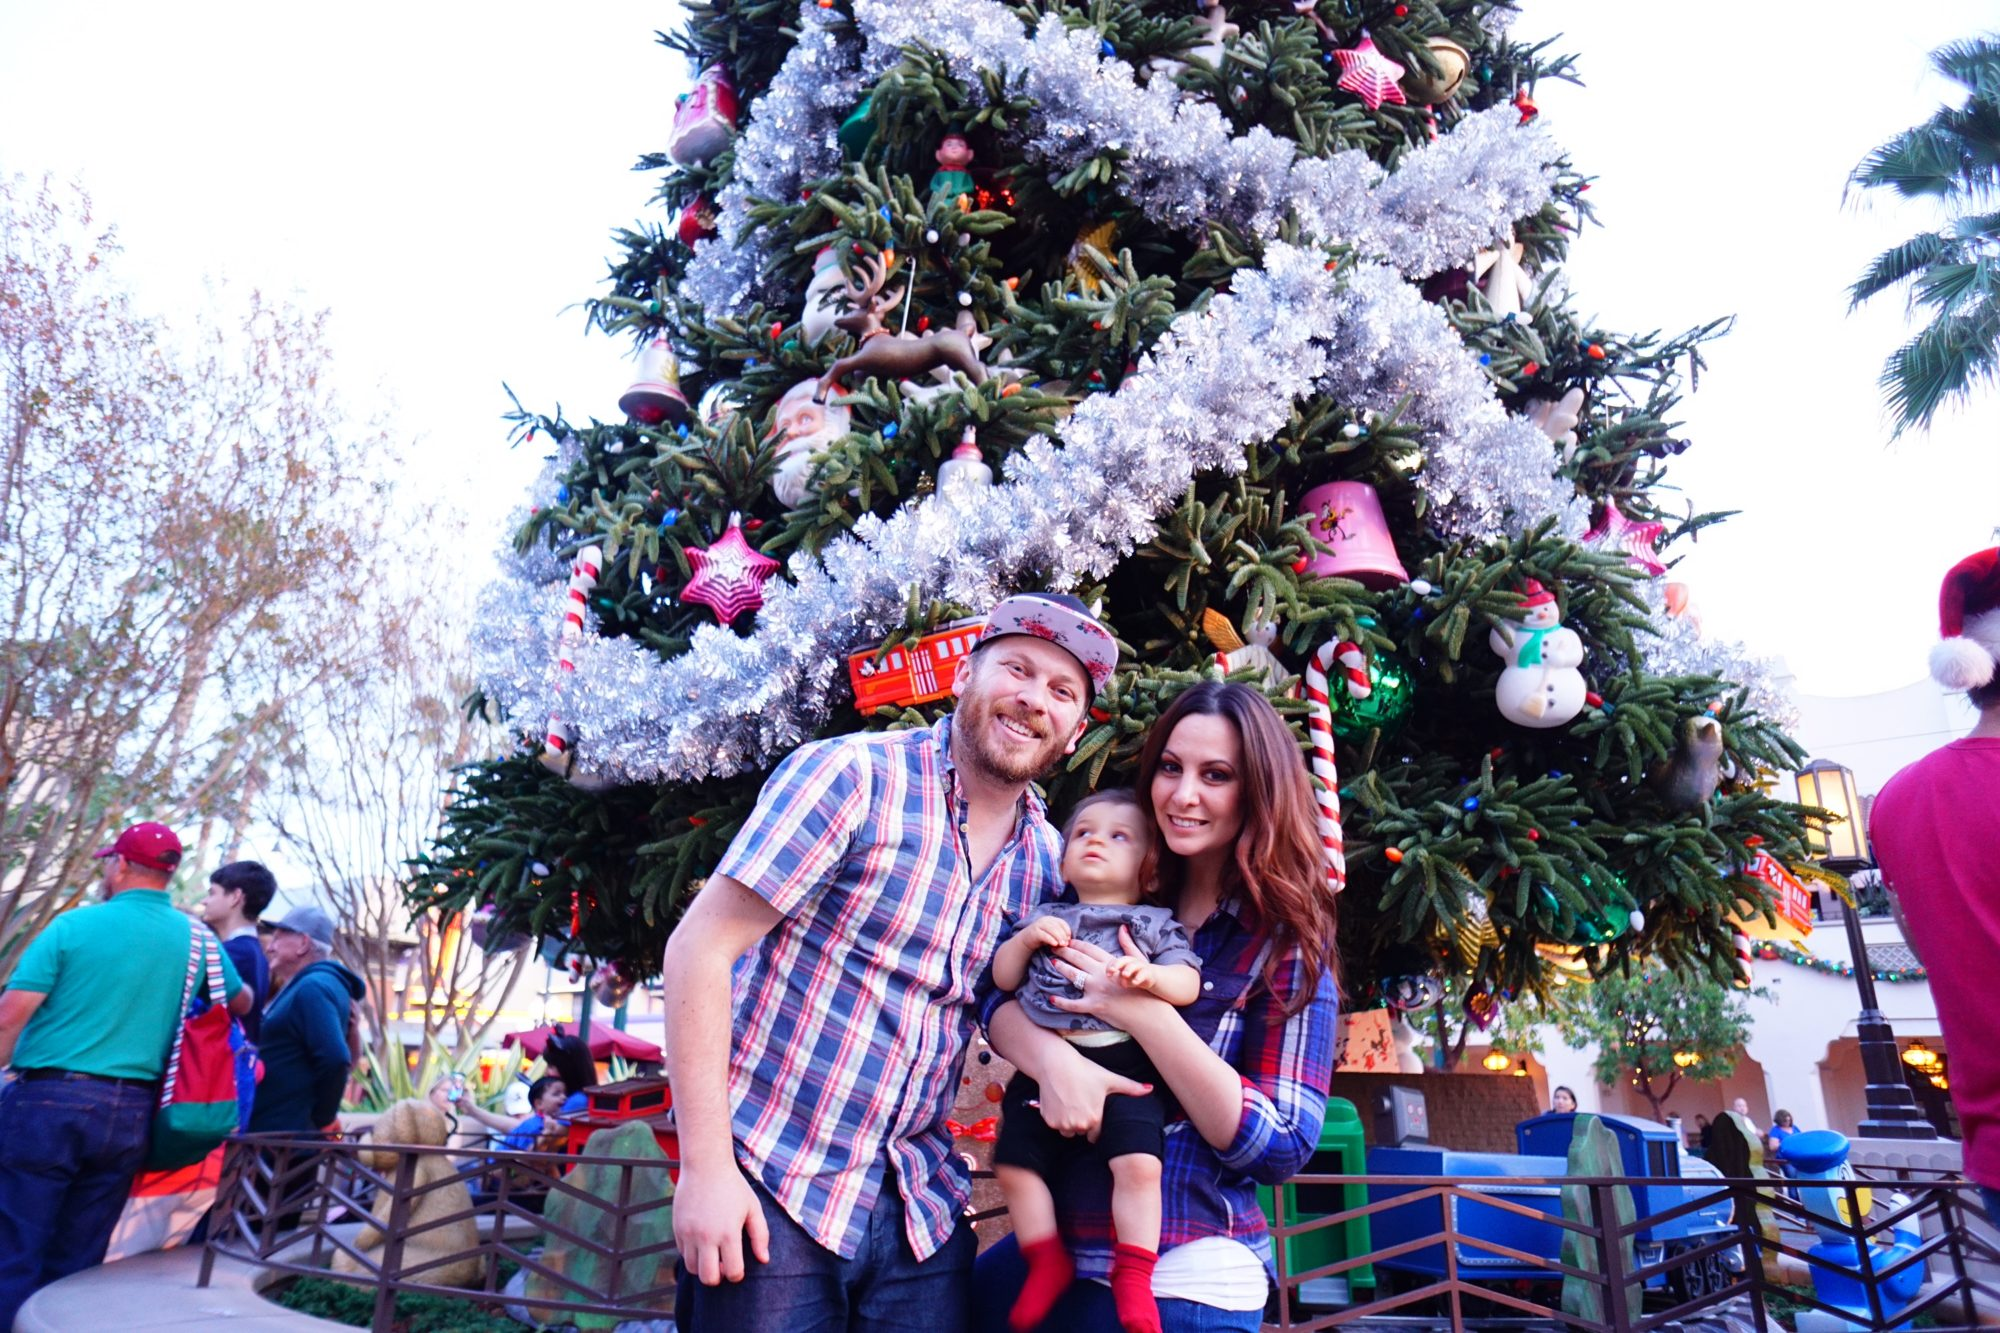 Family at Disney - TheFebruaryFox.com